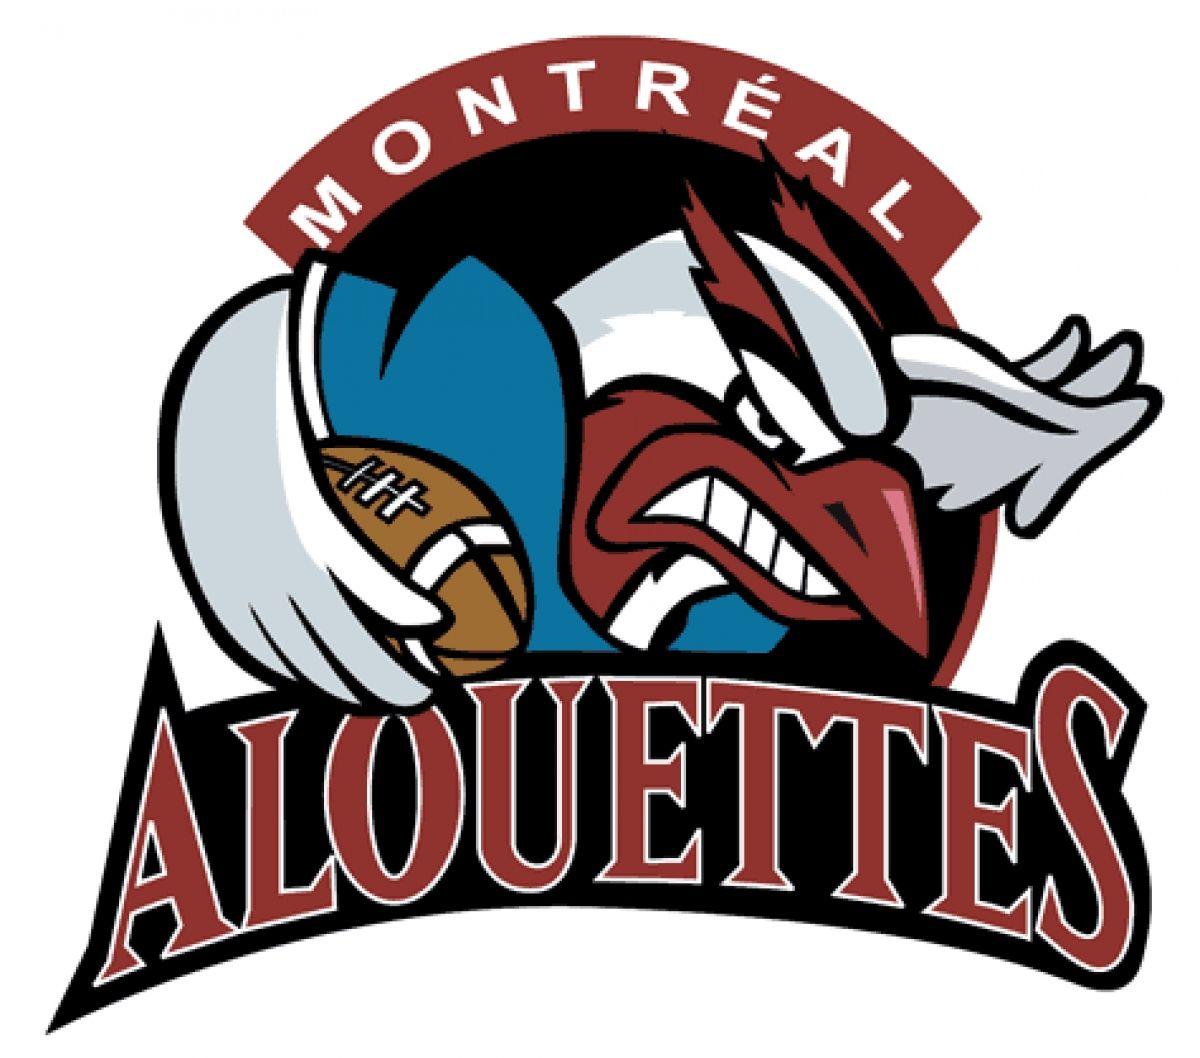 canadian football league emblem football logo